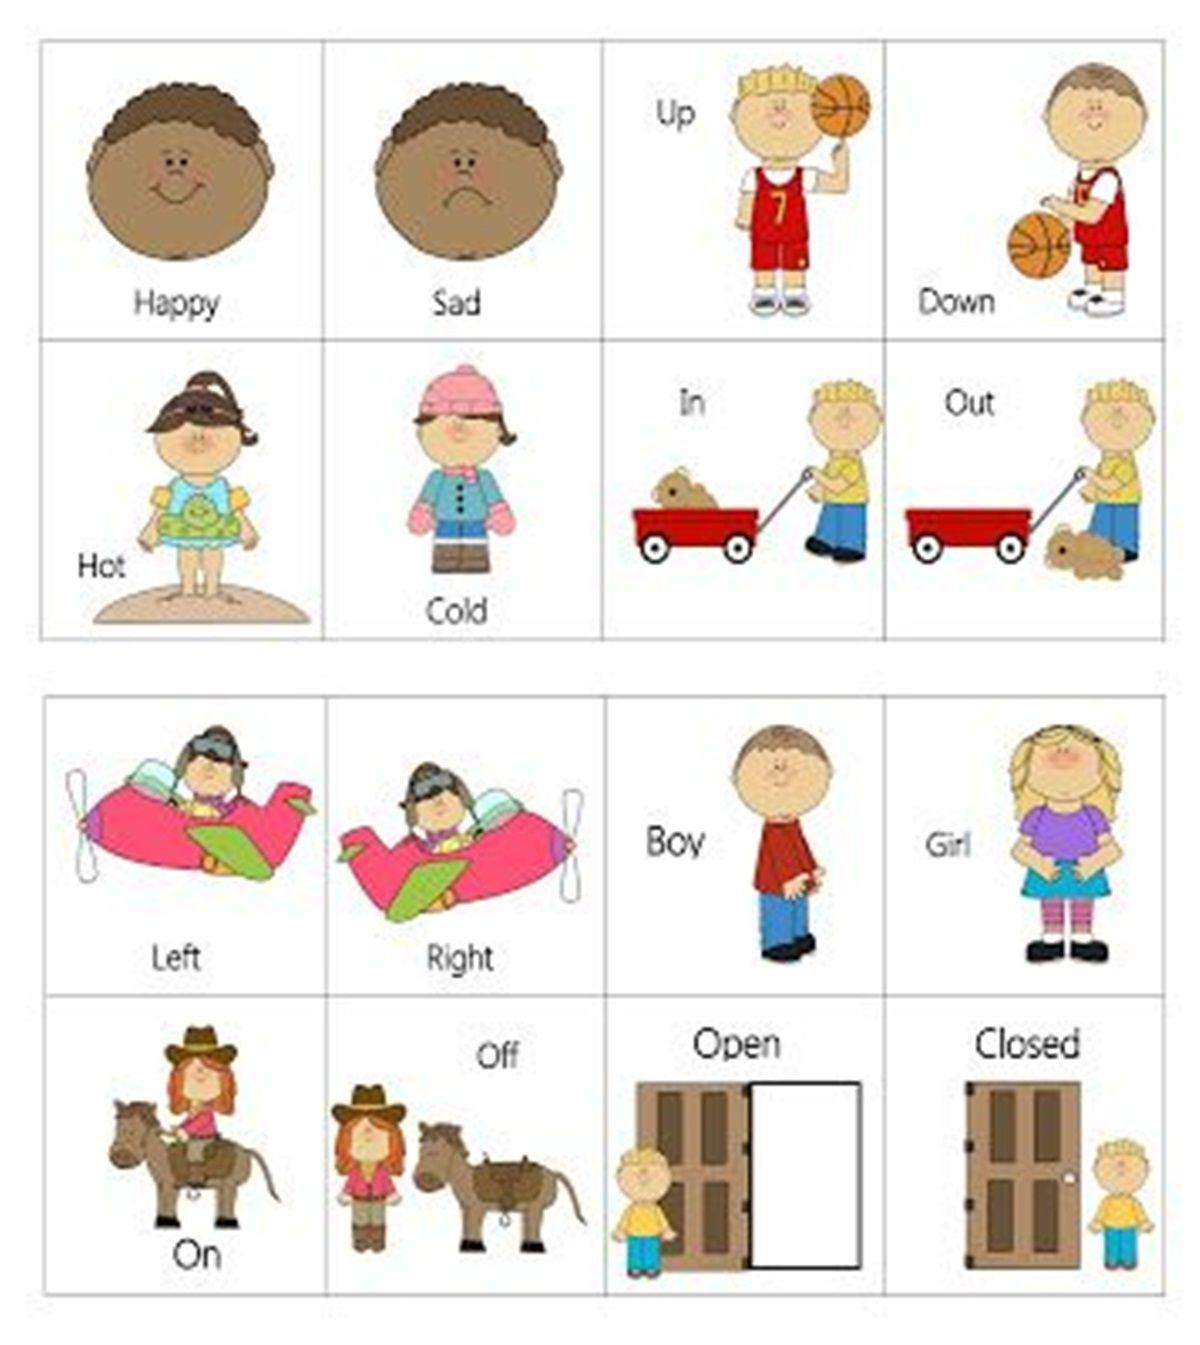 worksheet Opposite Worksheets opposites in the english language learn pinterest online learning community